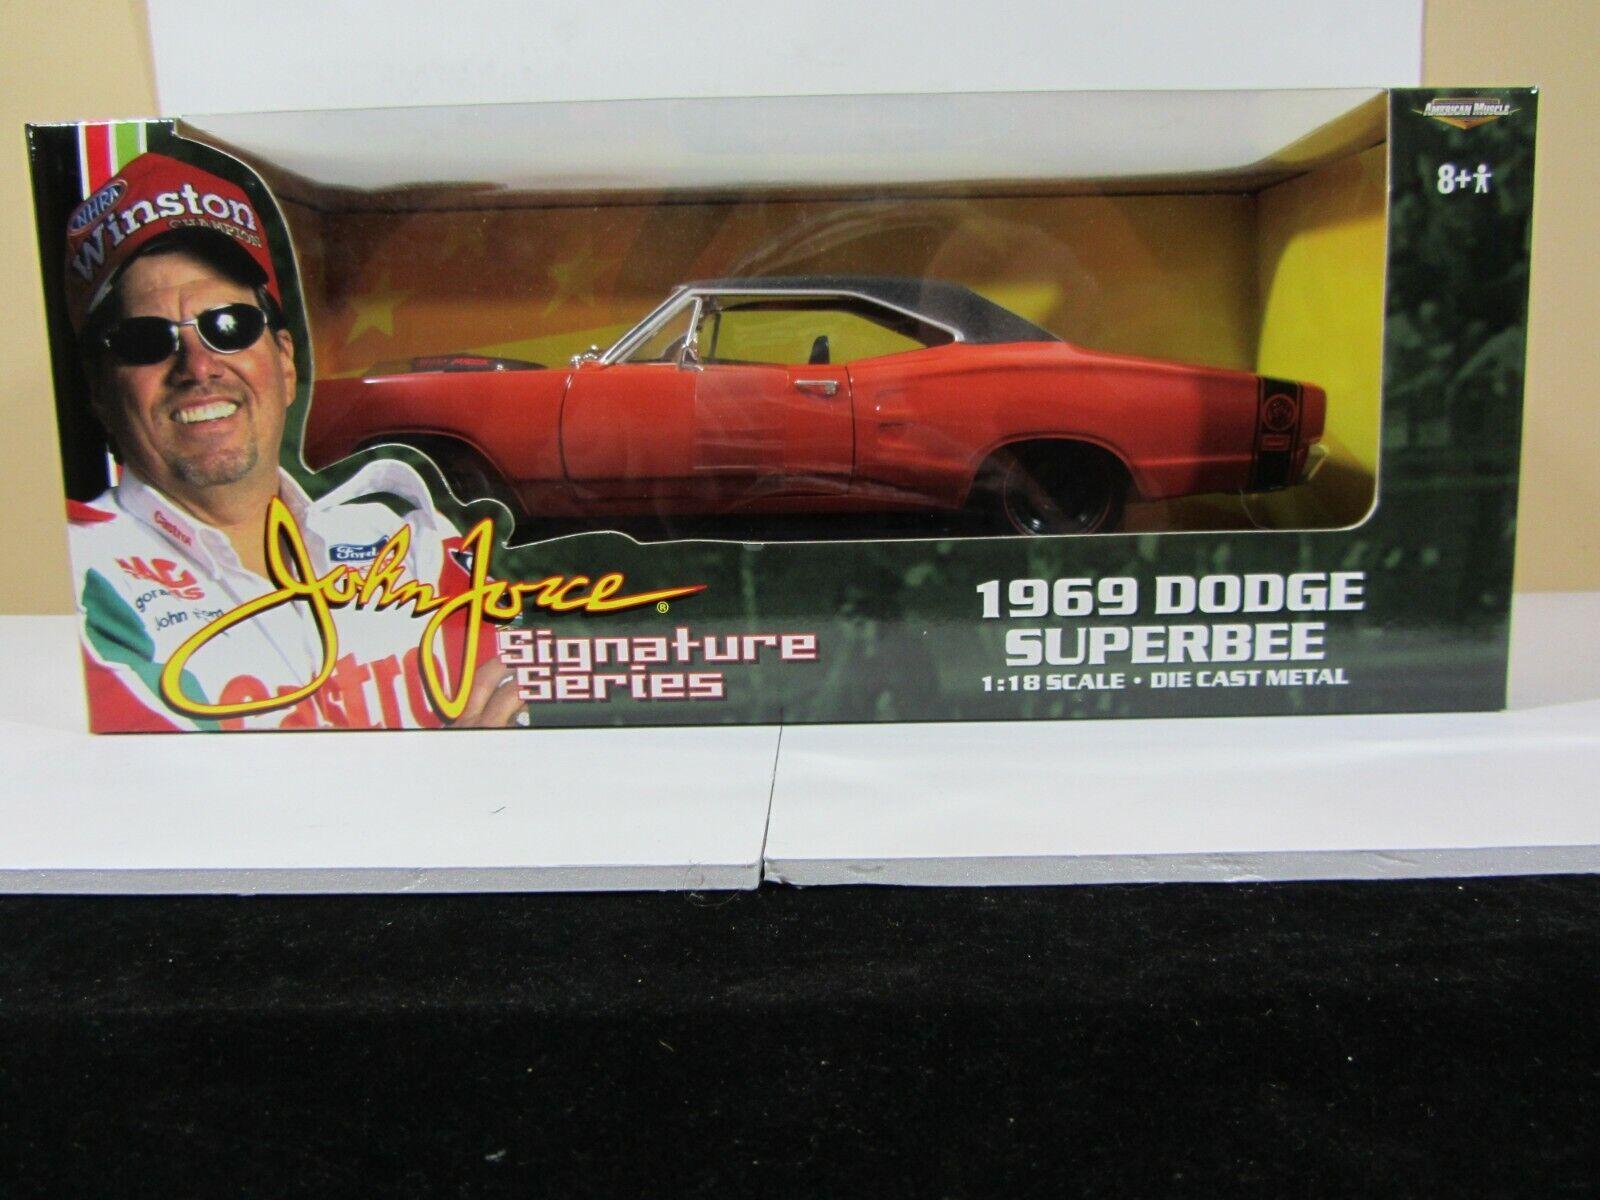 American Muscle John Force Series, 1969 Dodge súperbee 1 18 (G519) 32843